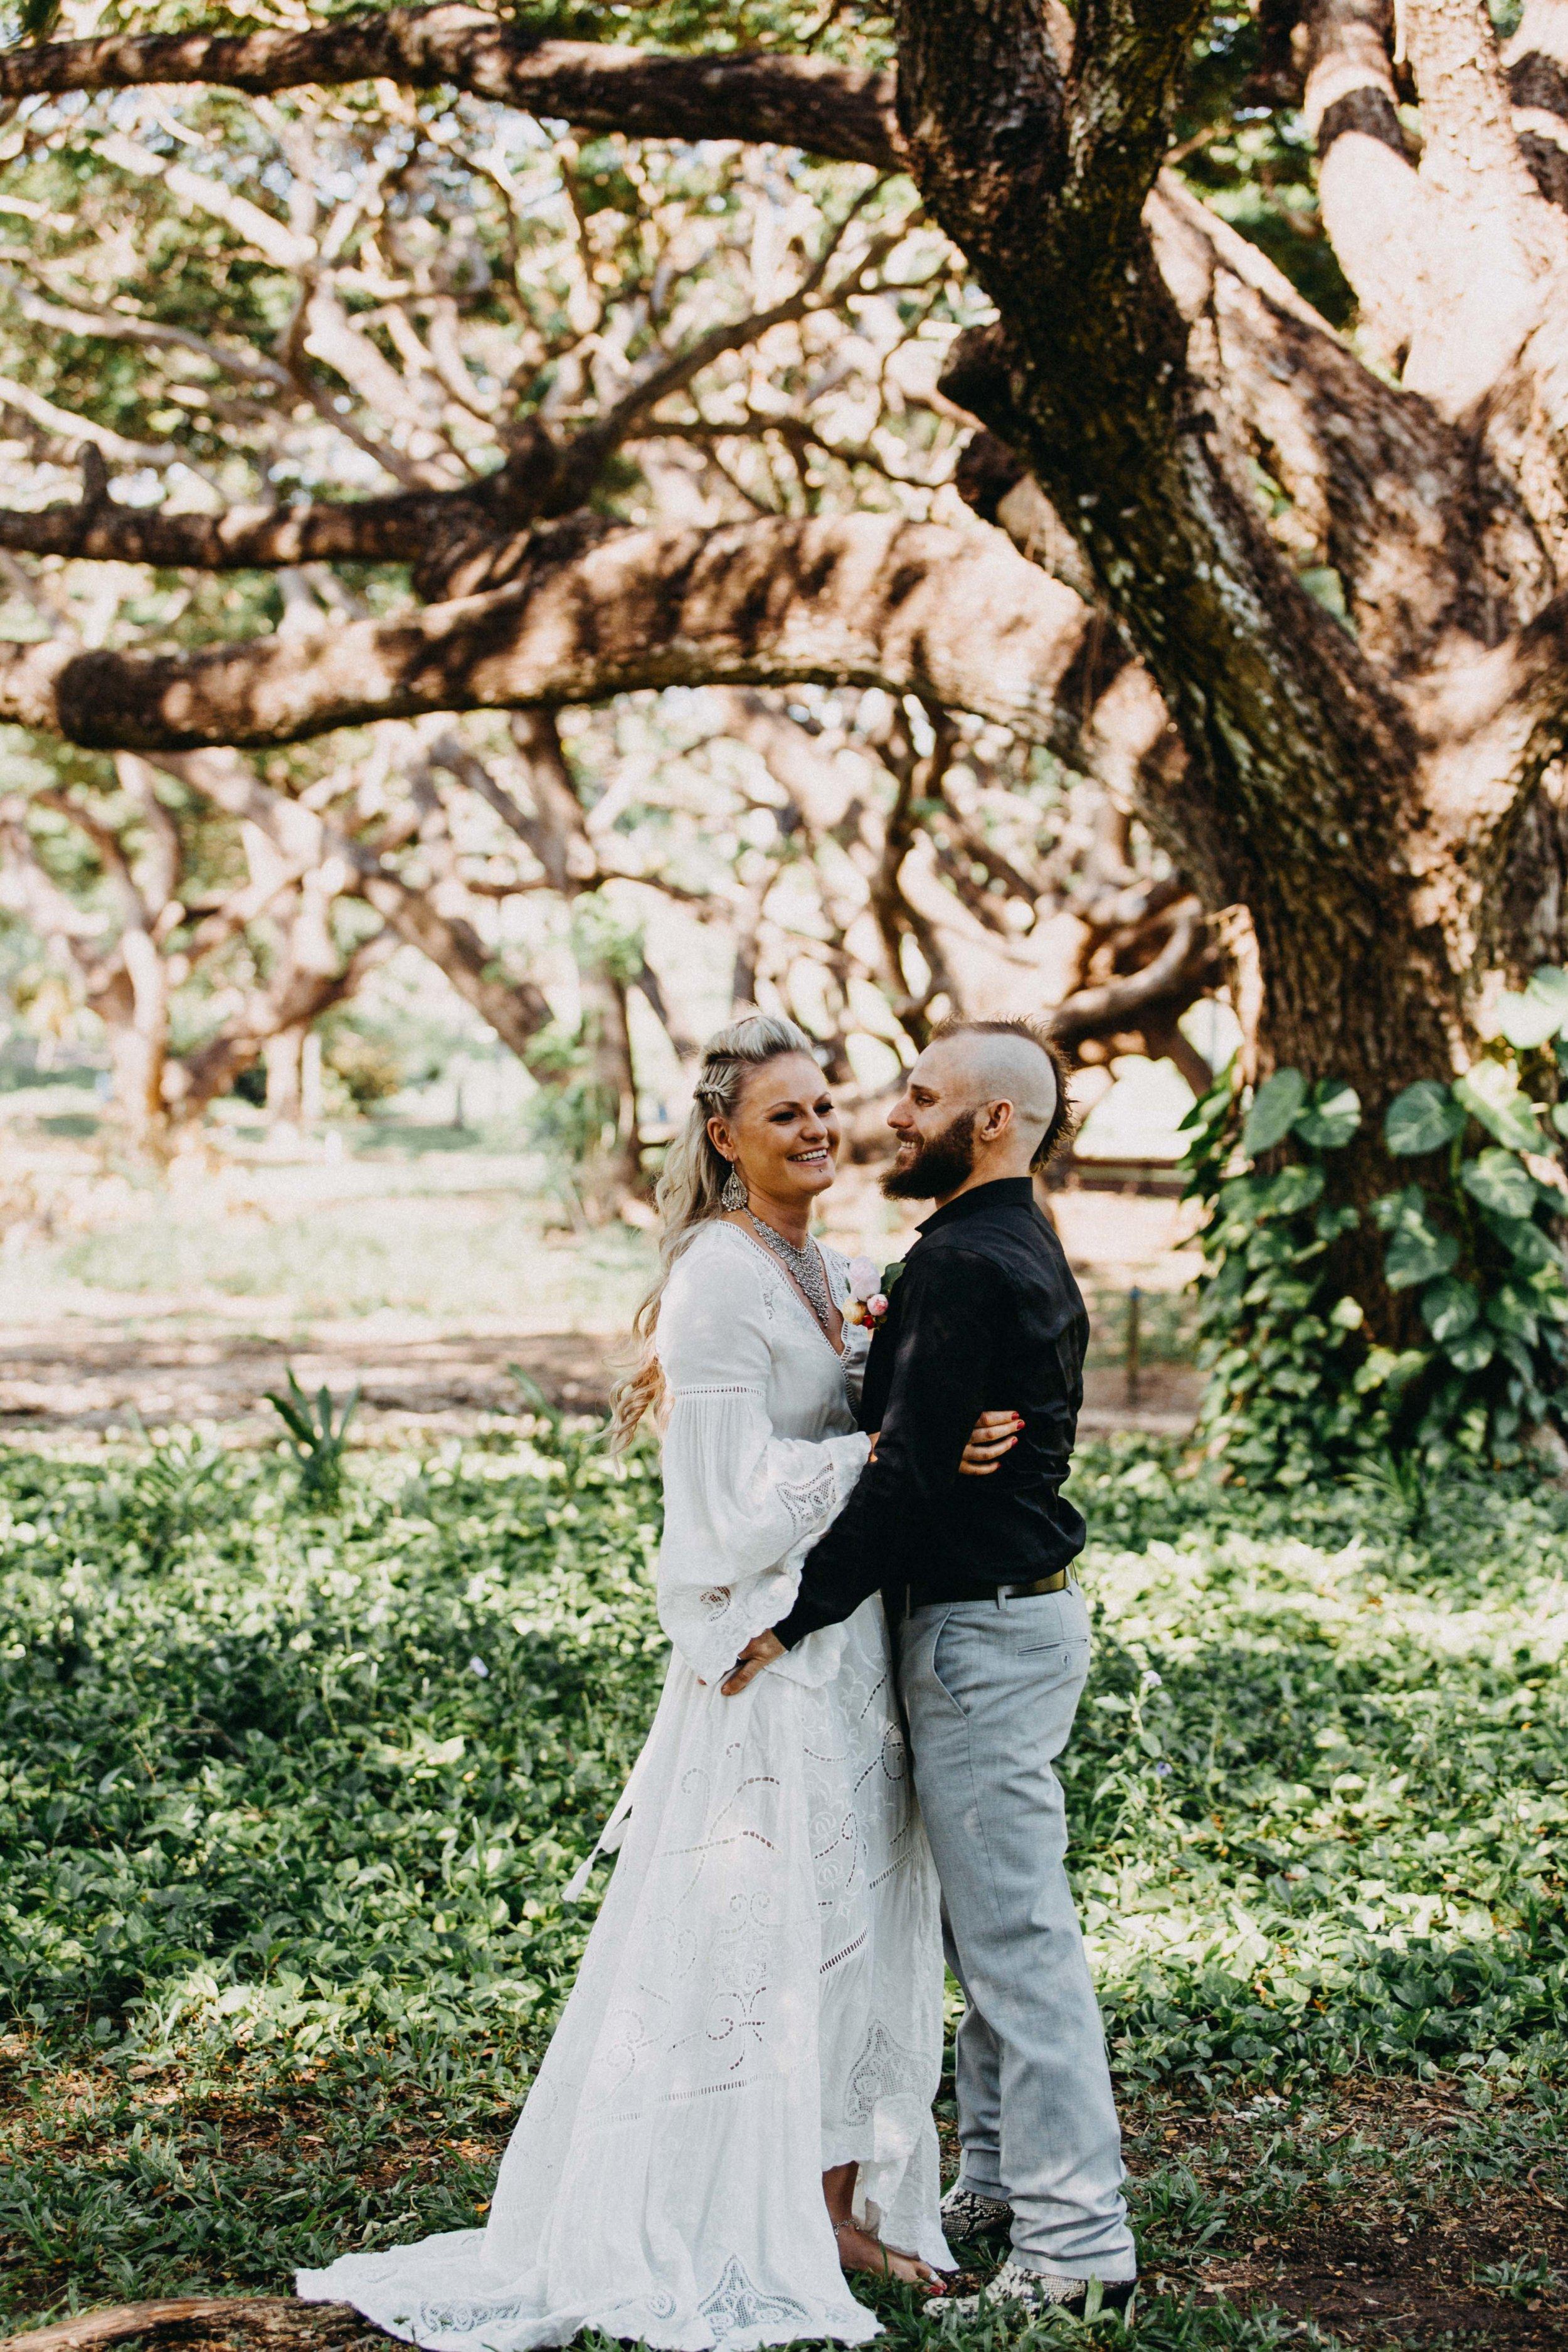 darwin-elopement-wedding-beach-camden-photography-www.emilyobrienphotography.net-24.jpg